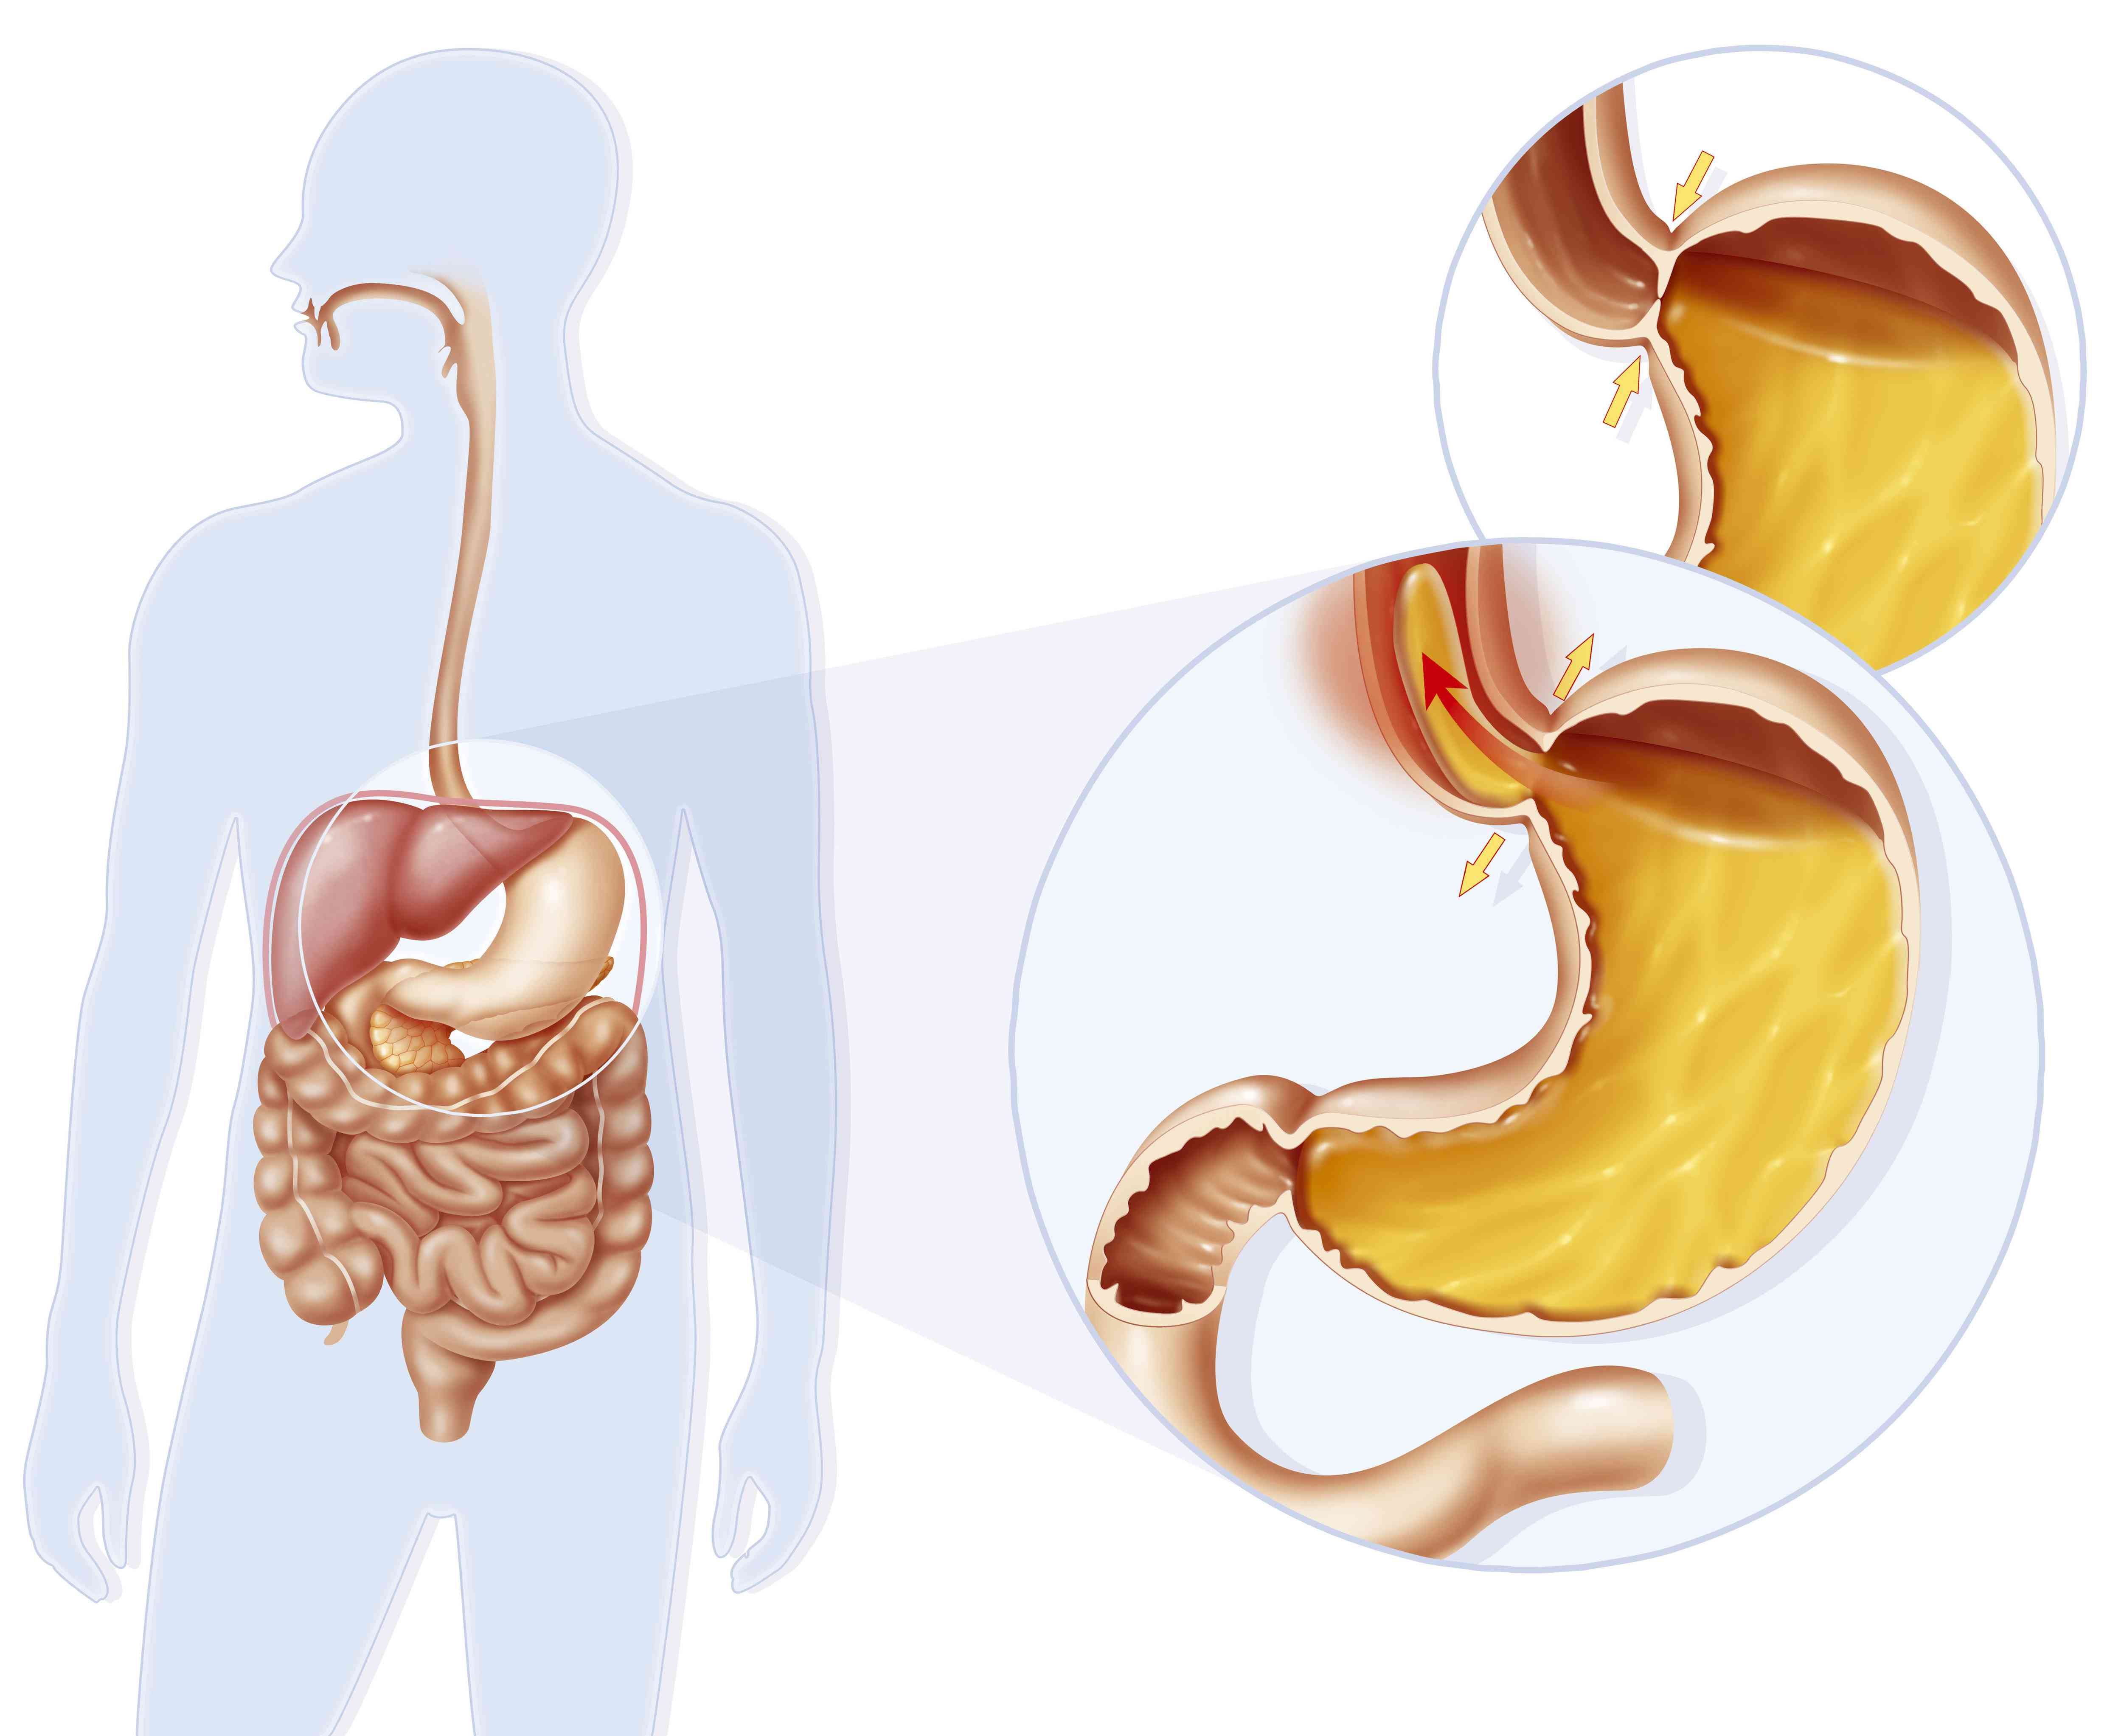 Acid reflux due to improper closure of sphincter